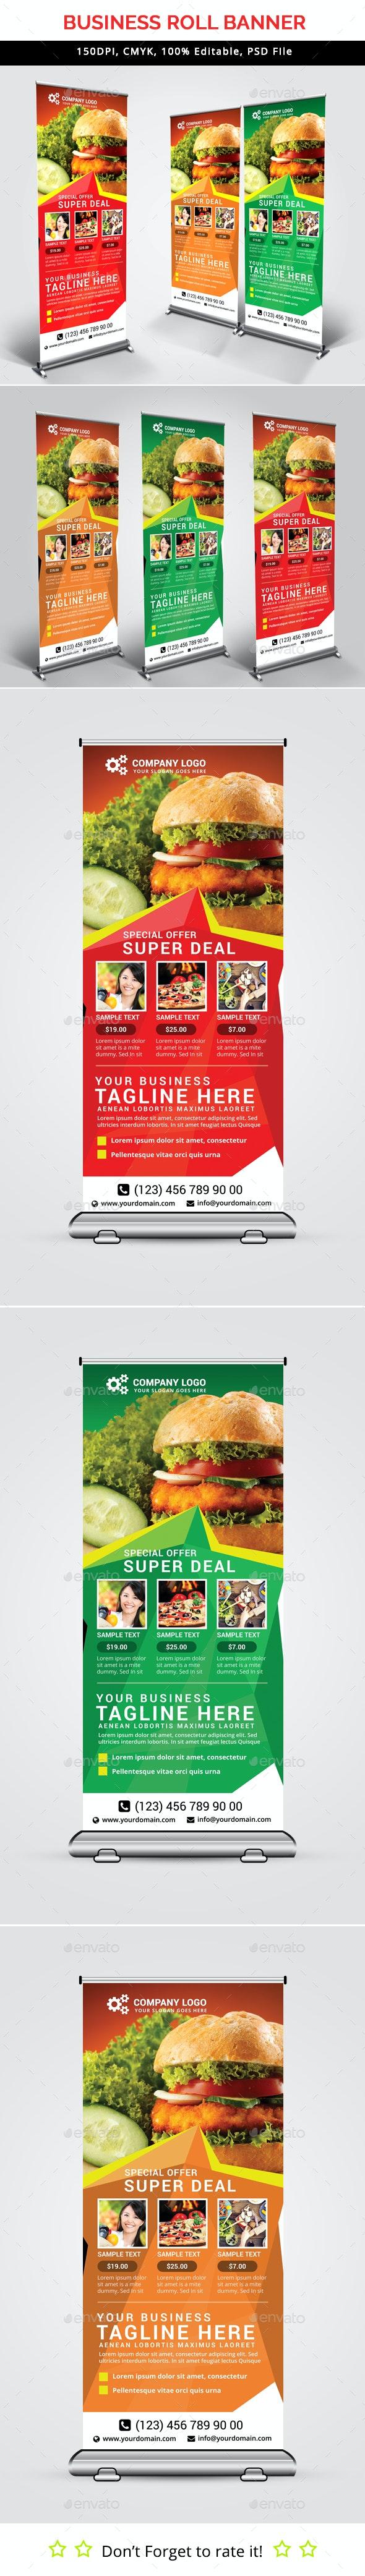 Fast Food Roll Up Banner V35 - Signage Print Templates